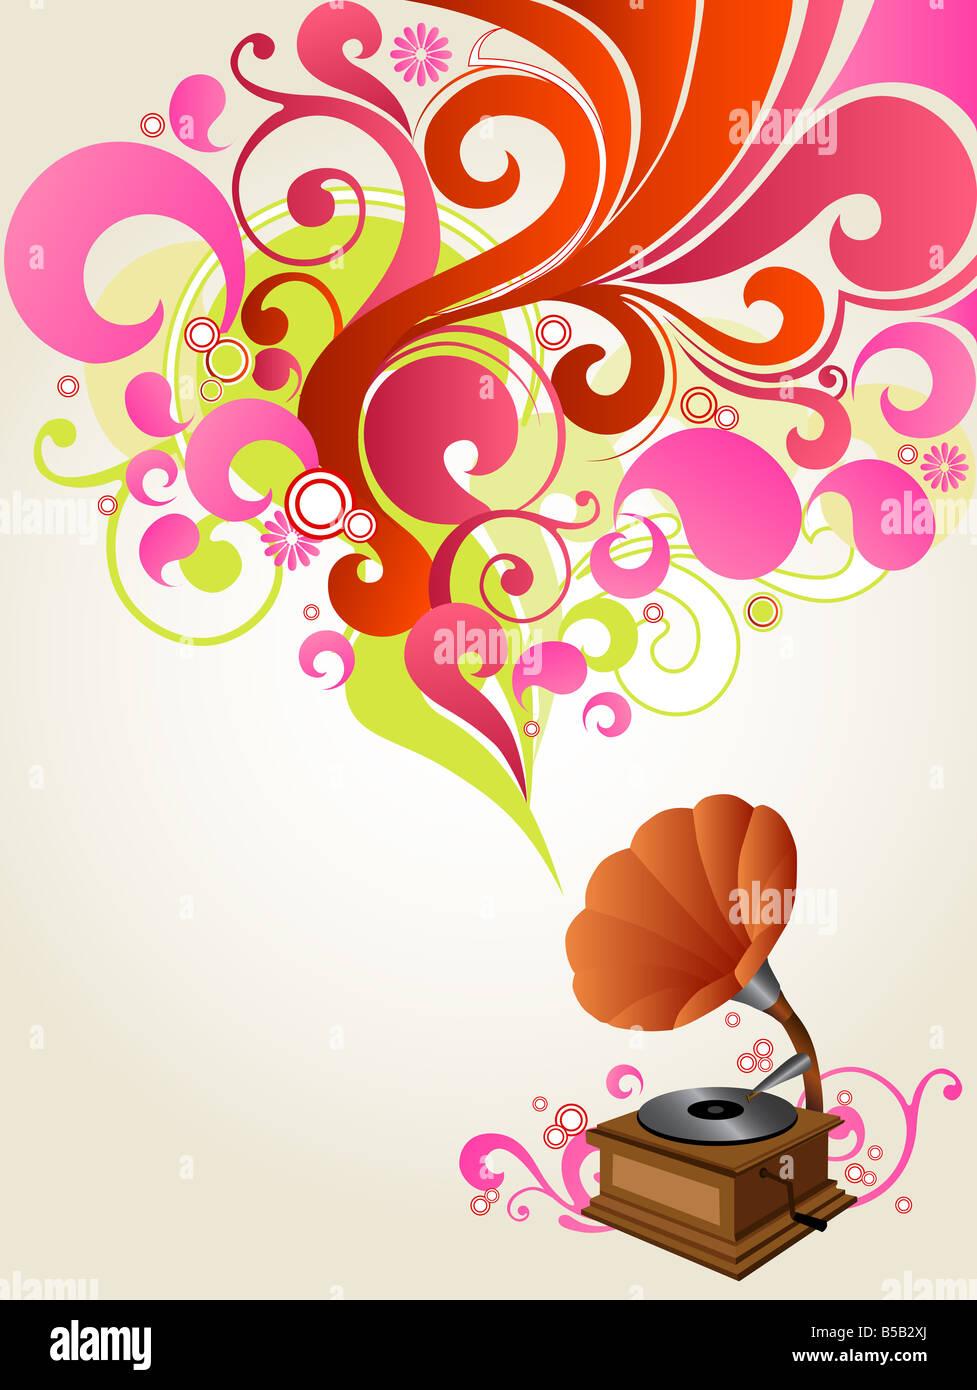 illustration drawing of music background - Stock Image